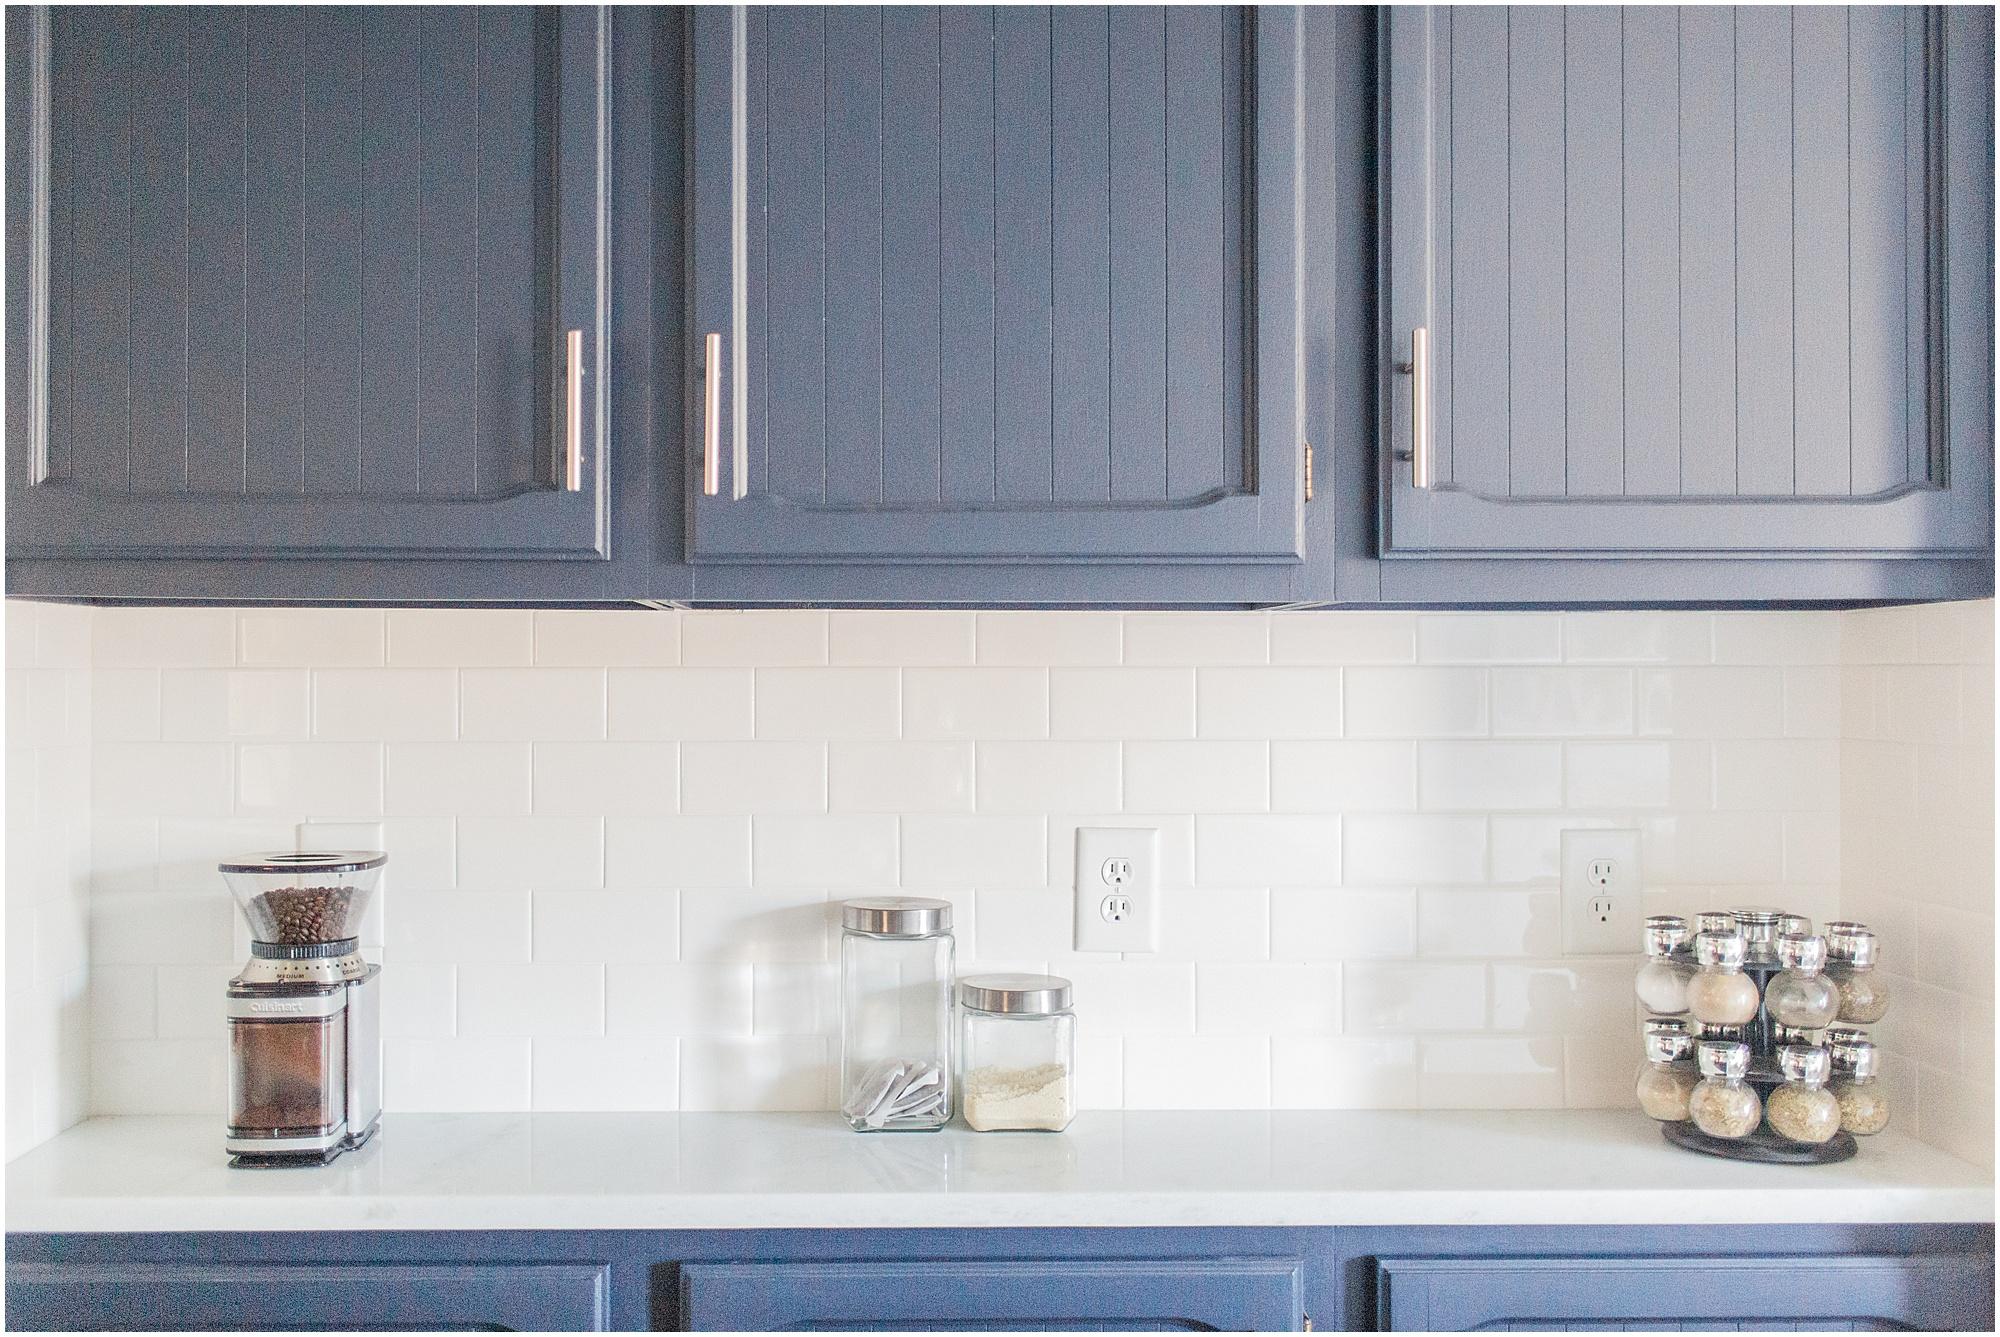 hambick-house-kitchen-renovation-fixer-upper_0011.jpg